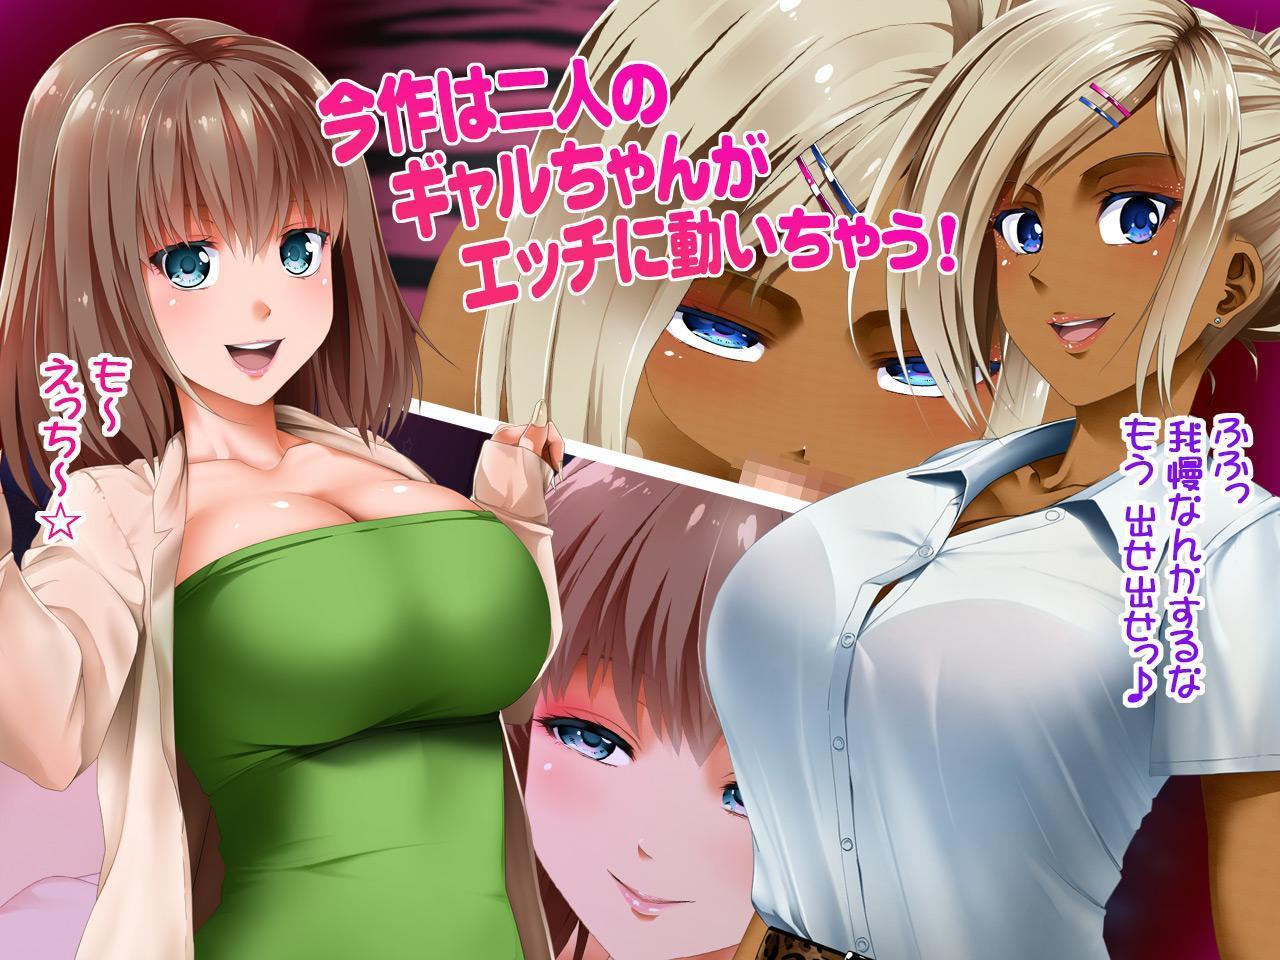 3D Eroanime ladies act in eroanime 2anime sex